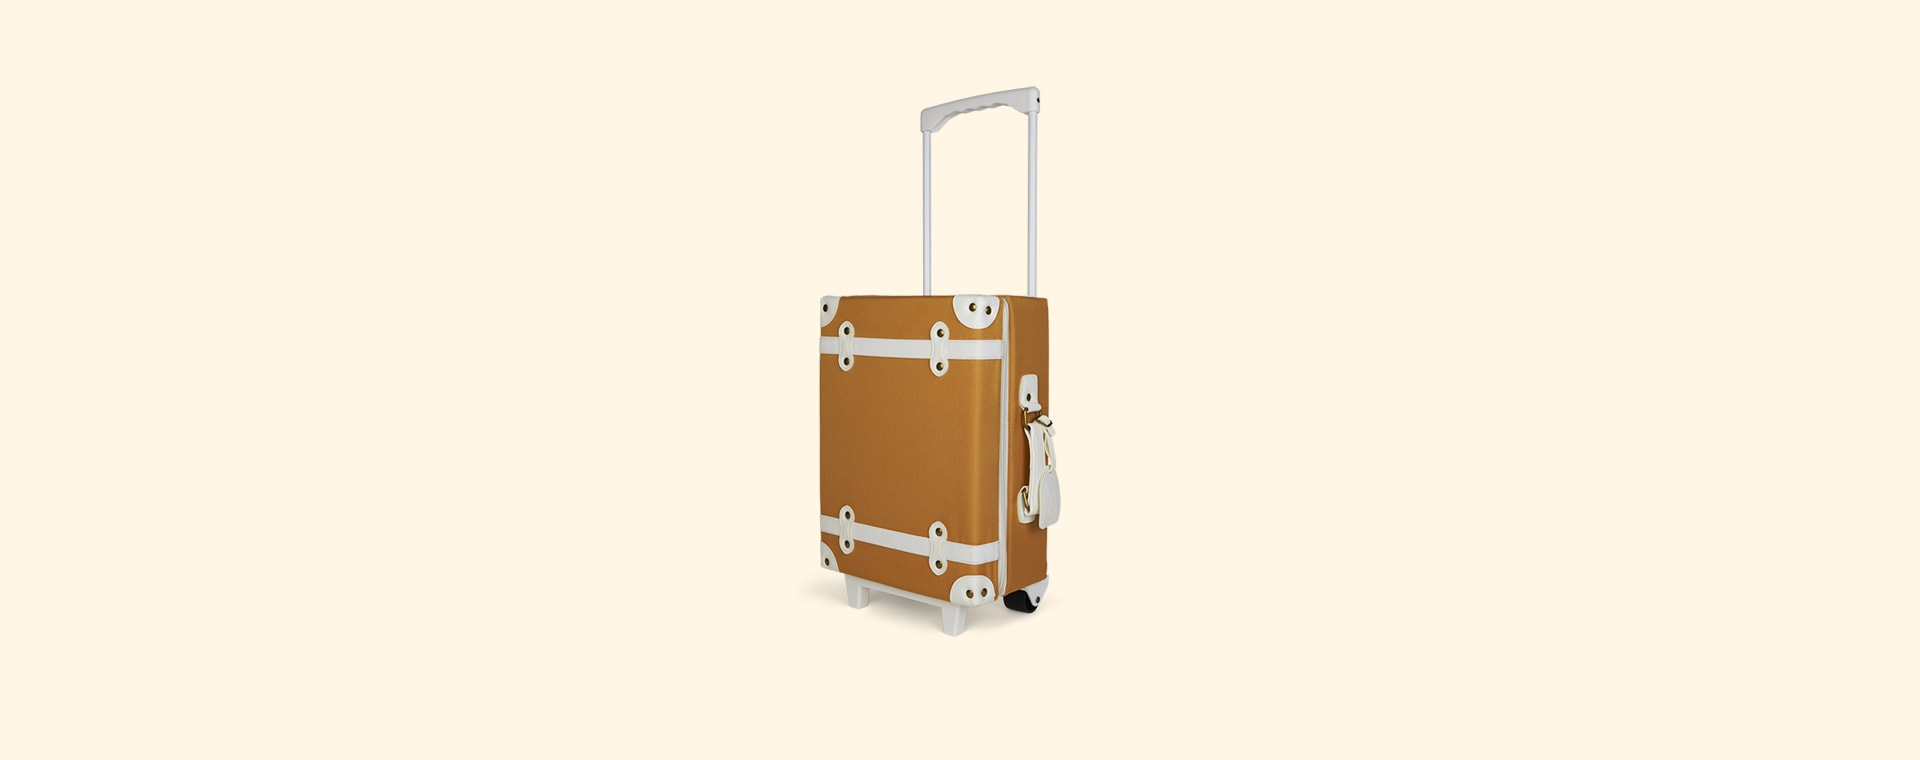 Apricot Olli Ella See-Ya Suitcase